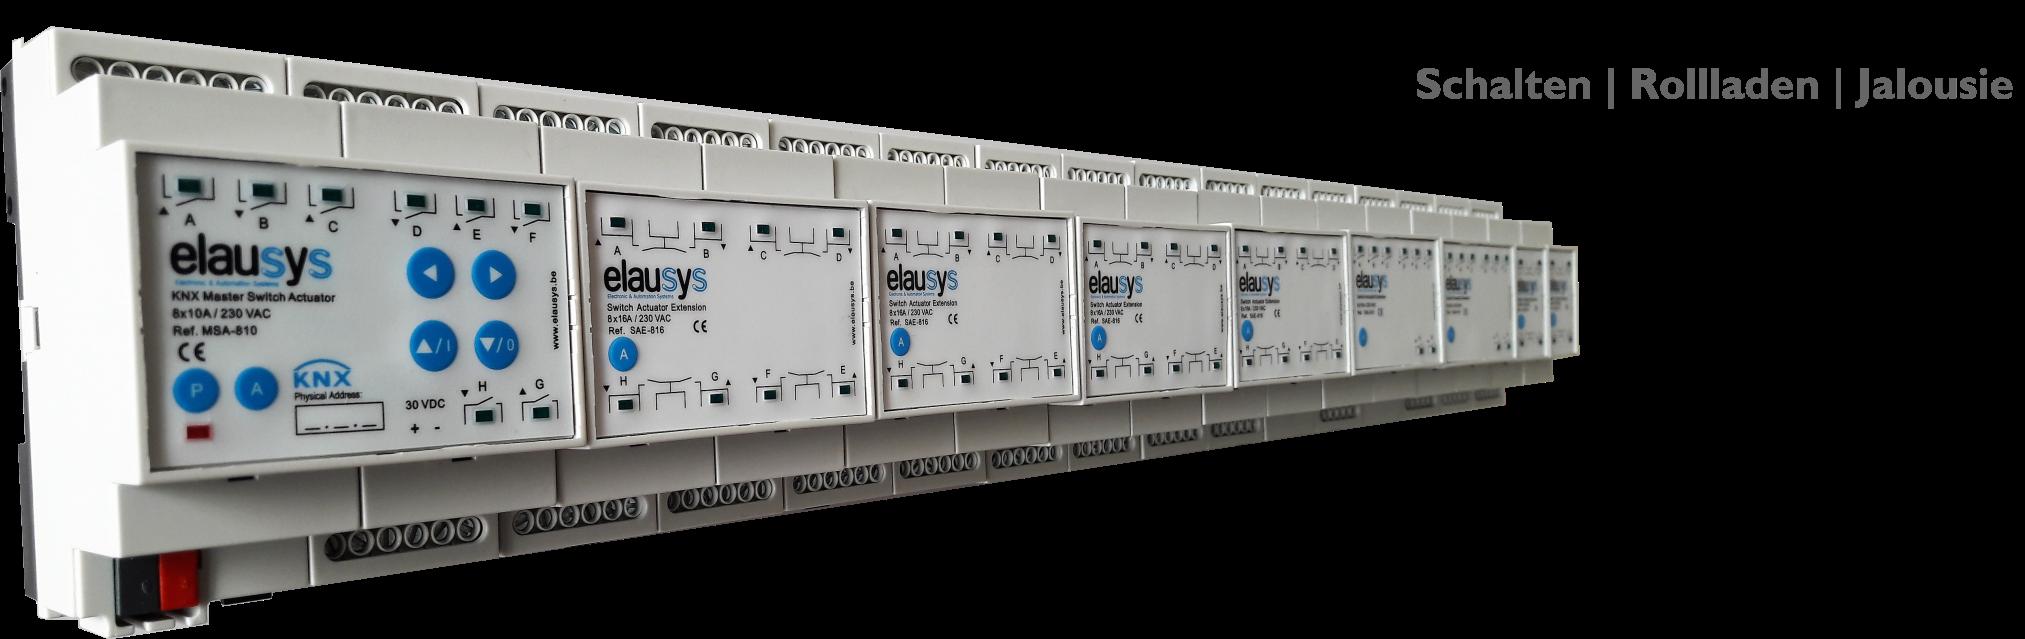 KNX Actuator system